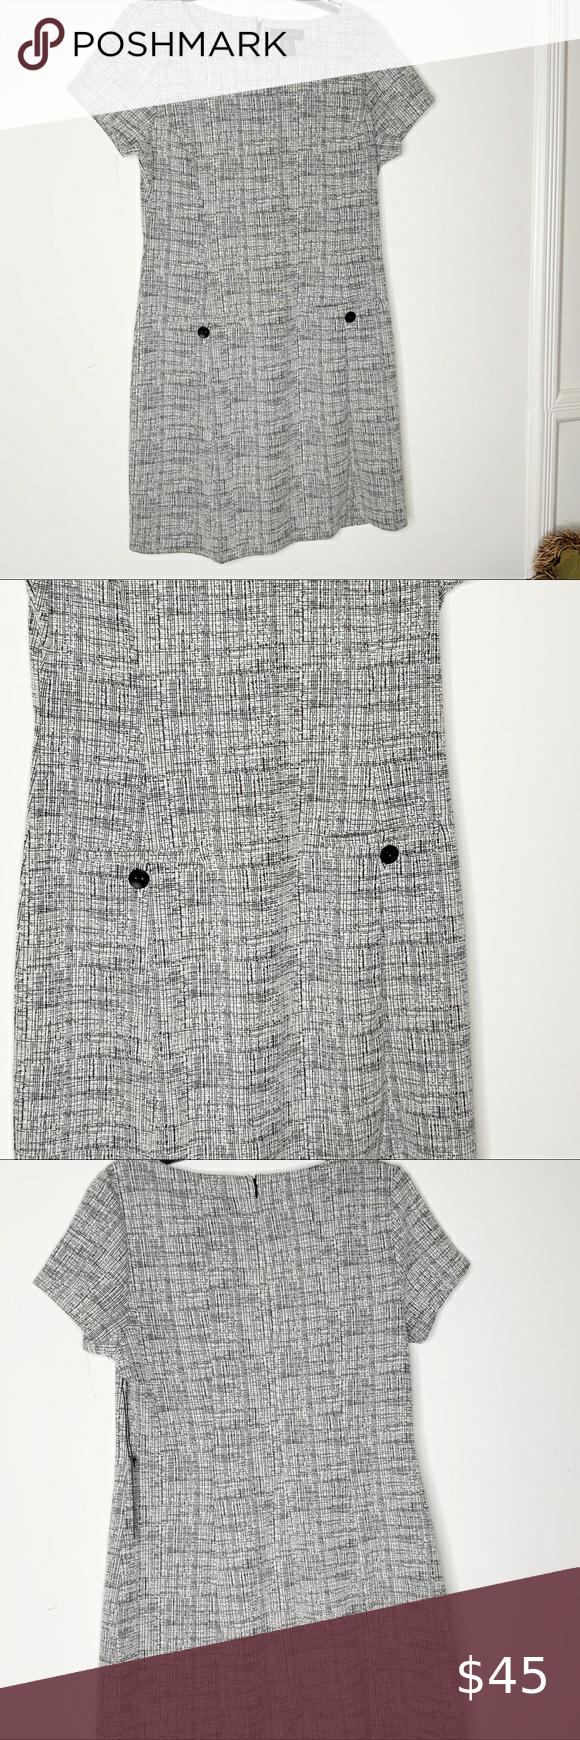 Tahari Black And White Dress Size 12 Nwt In 2020 Black N White Dress Black White Mini Dress White Dress [ 1740 x 580 Pixel ]